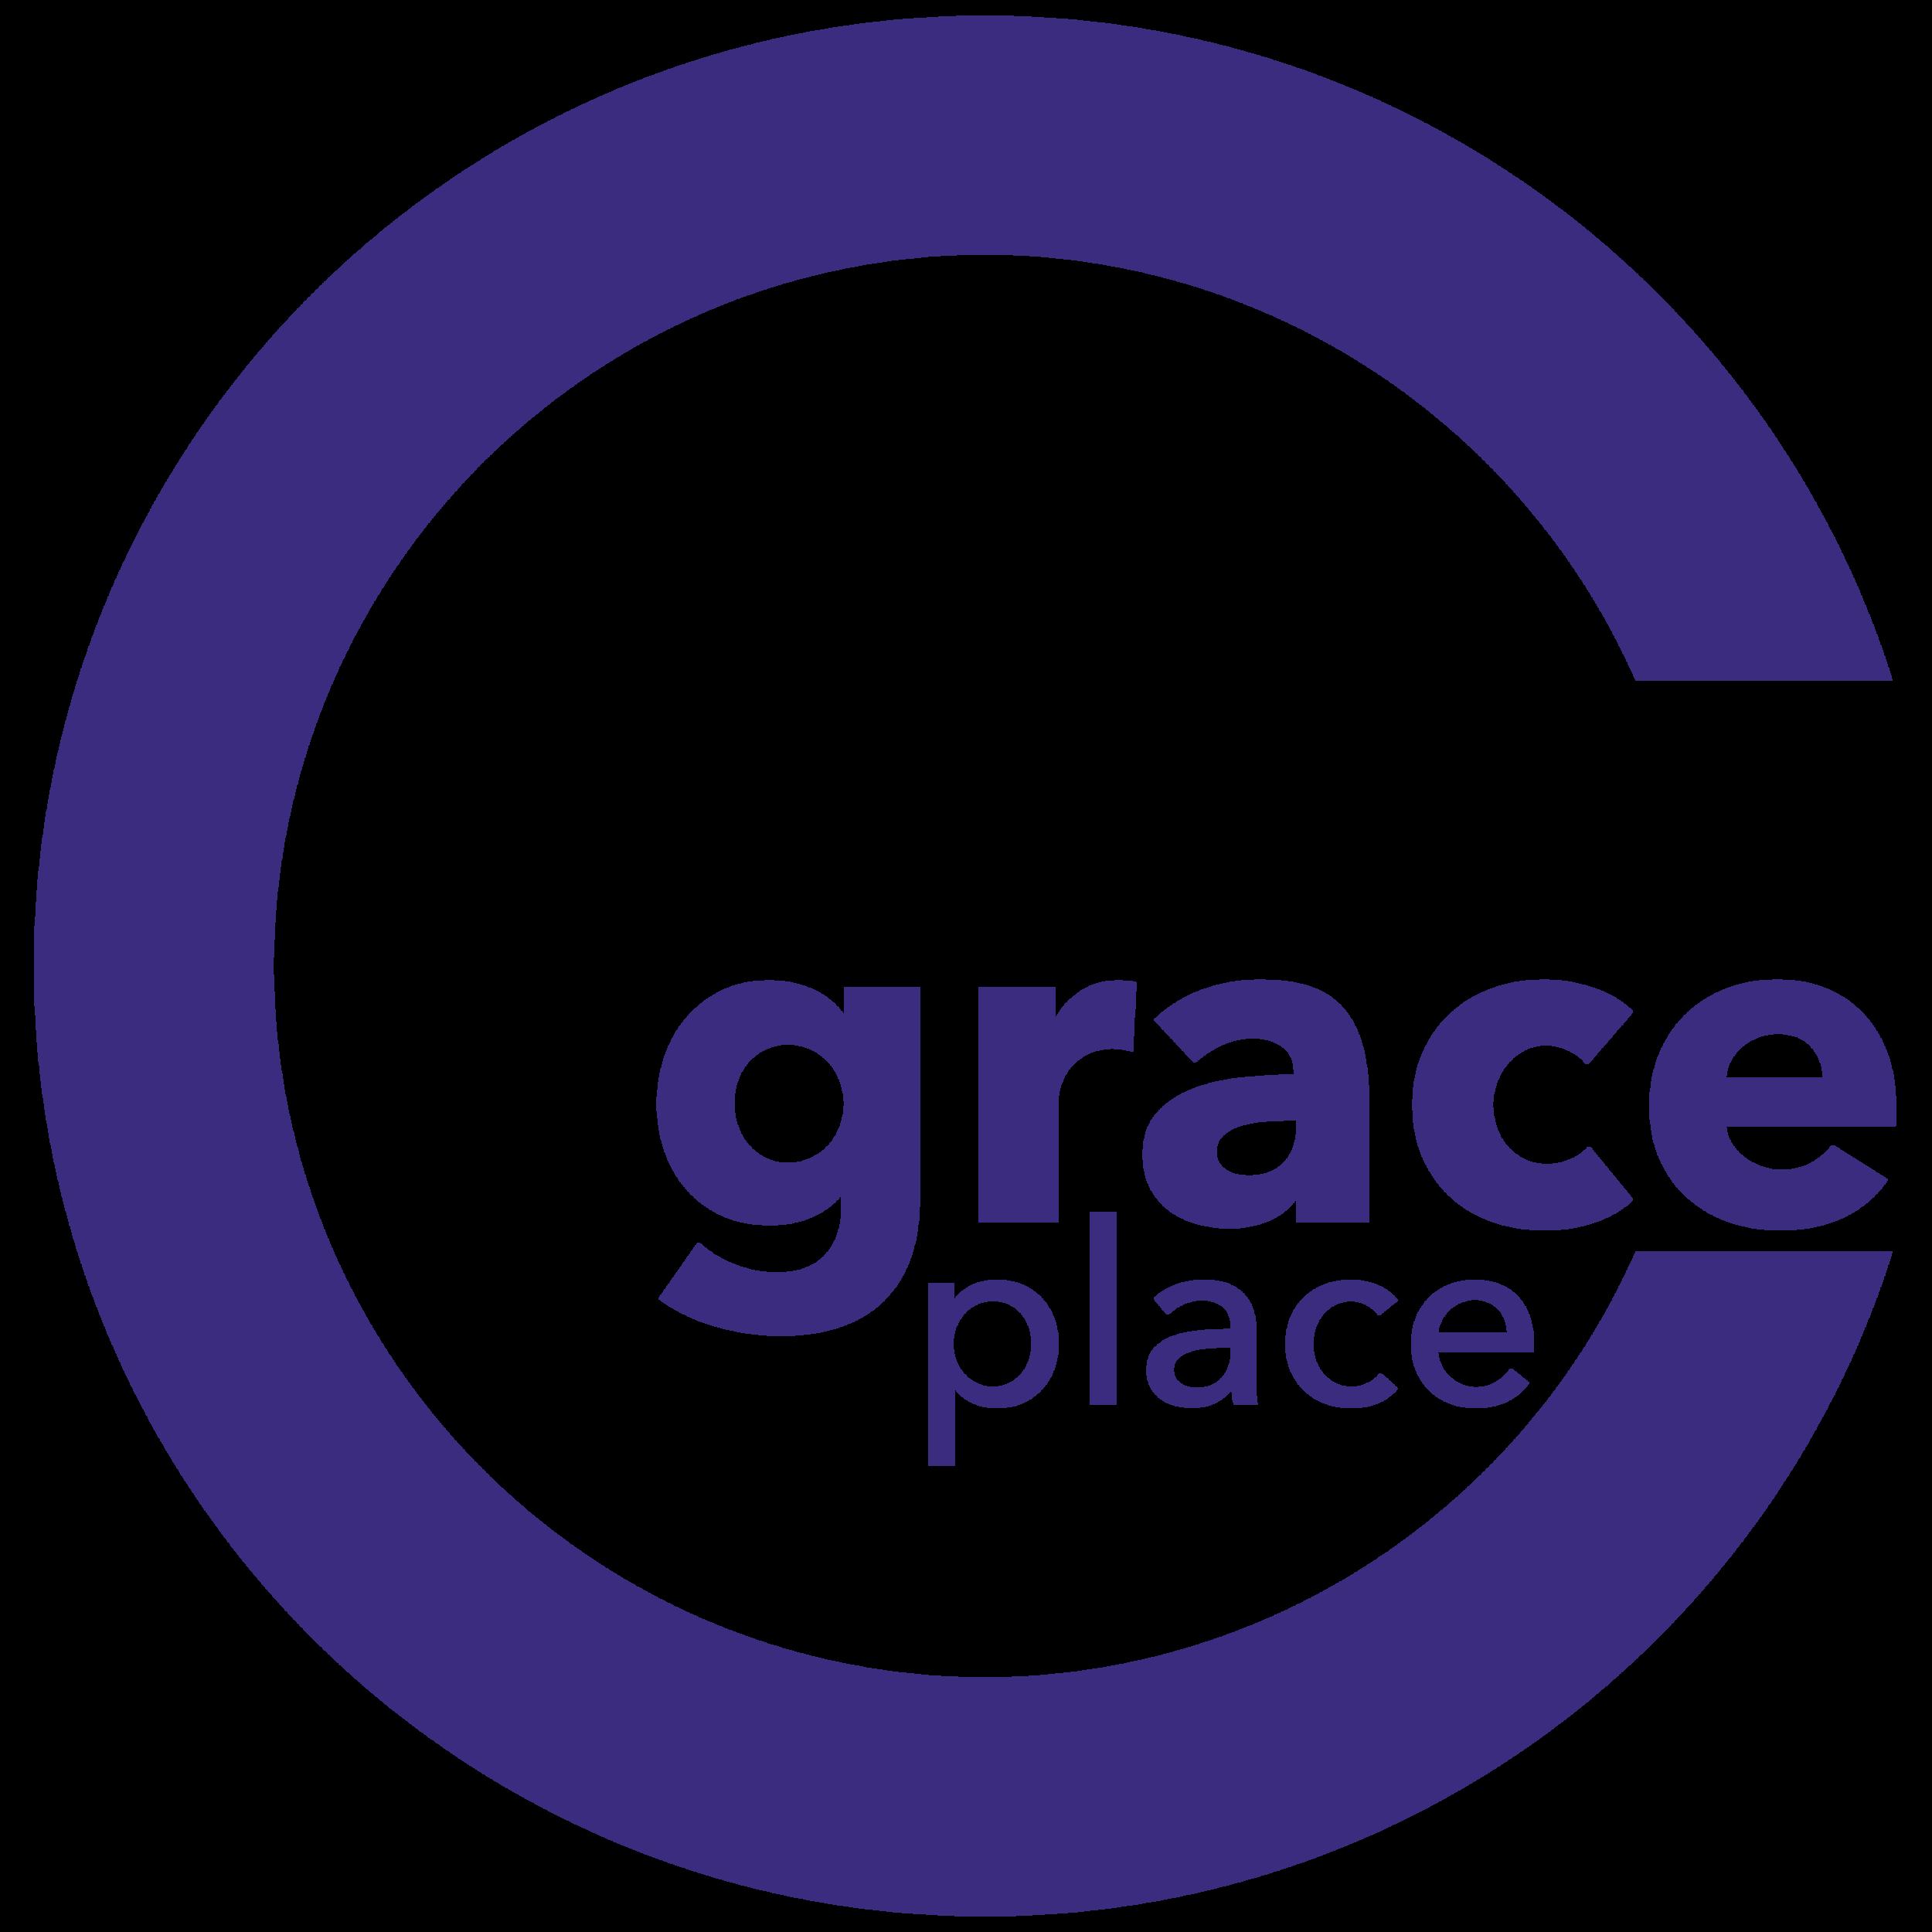 graceplace_purple.png